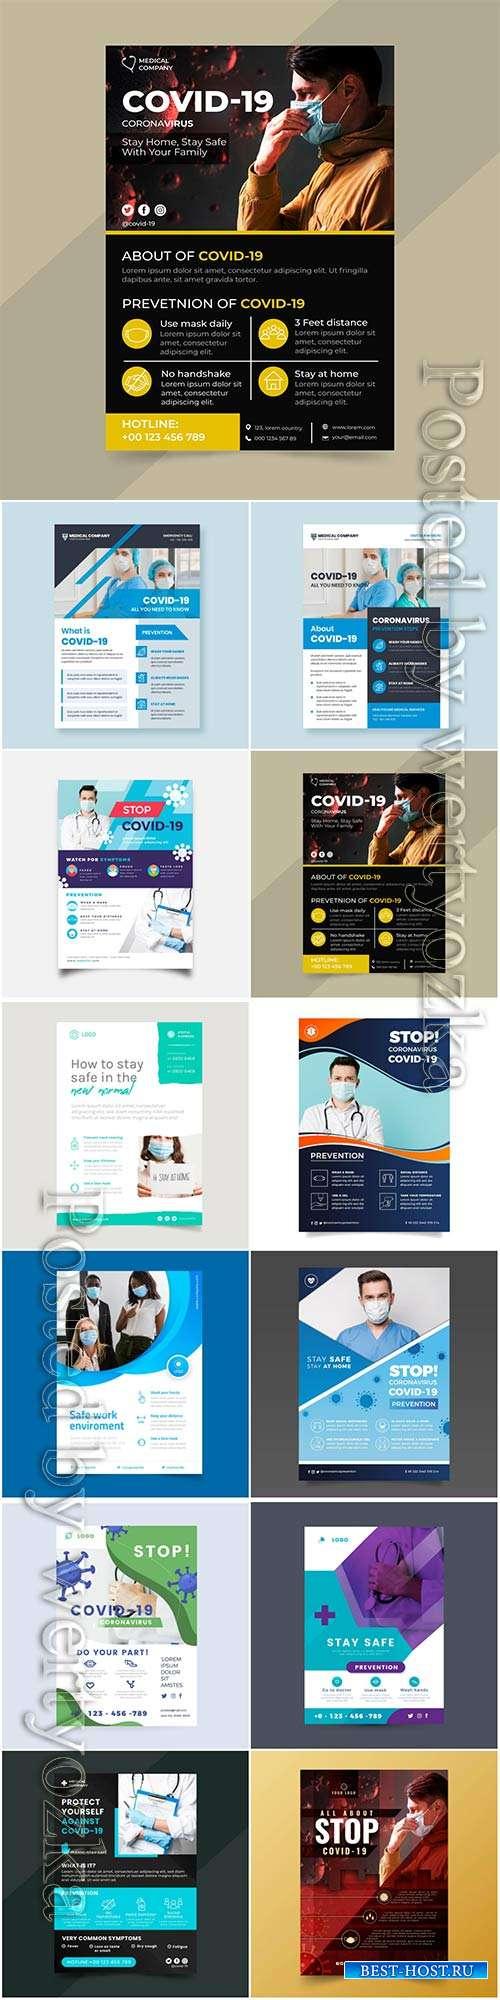 Realistic coronavirus vector background, stop covid-19 vol 4